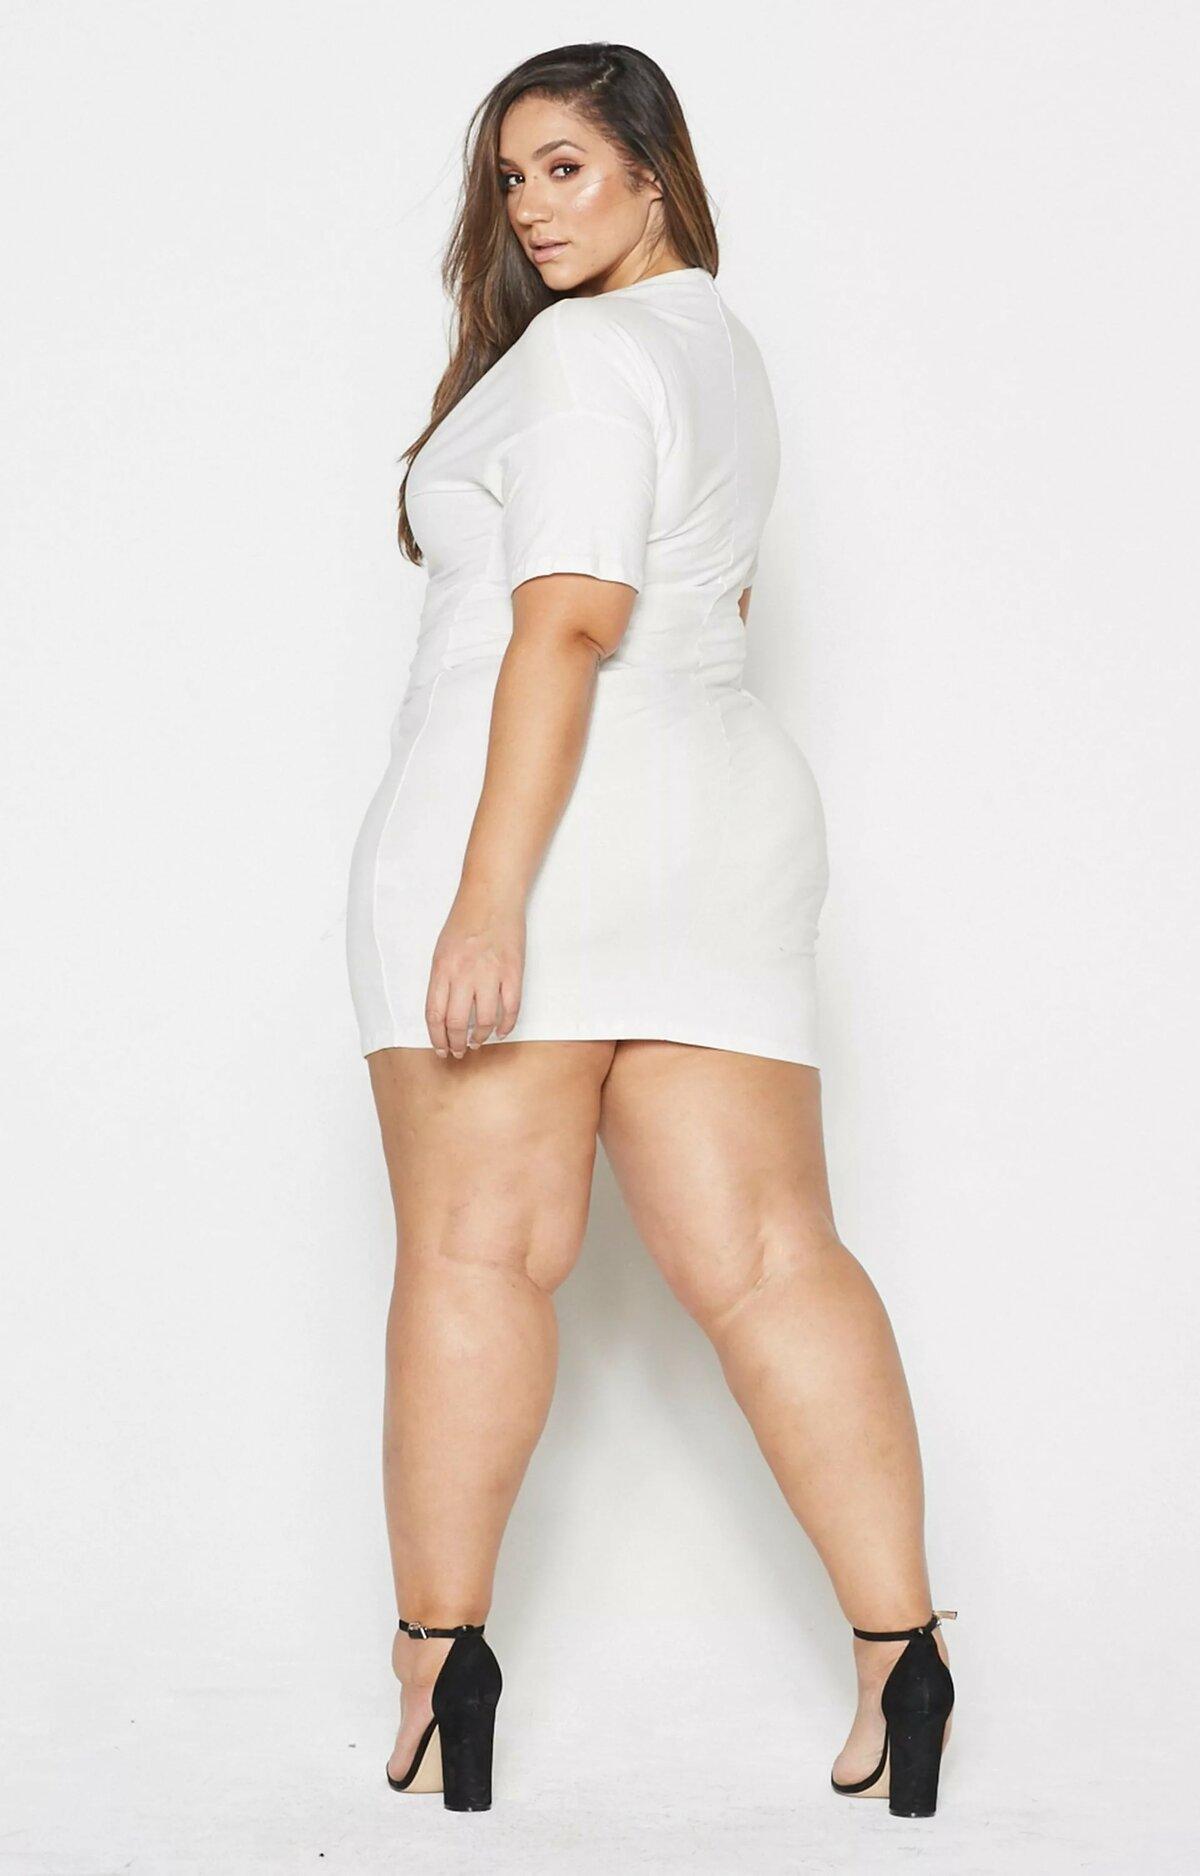 Chubby girls leg photos